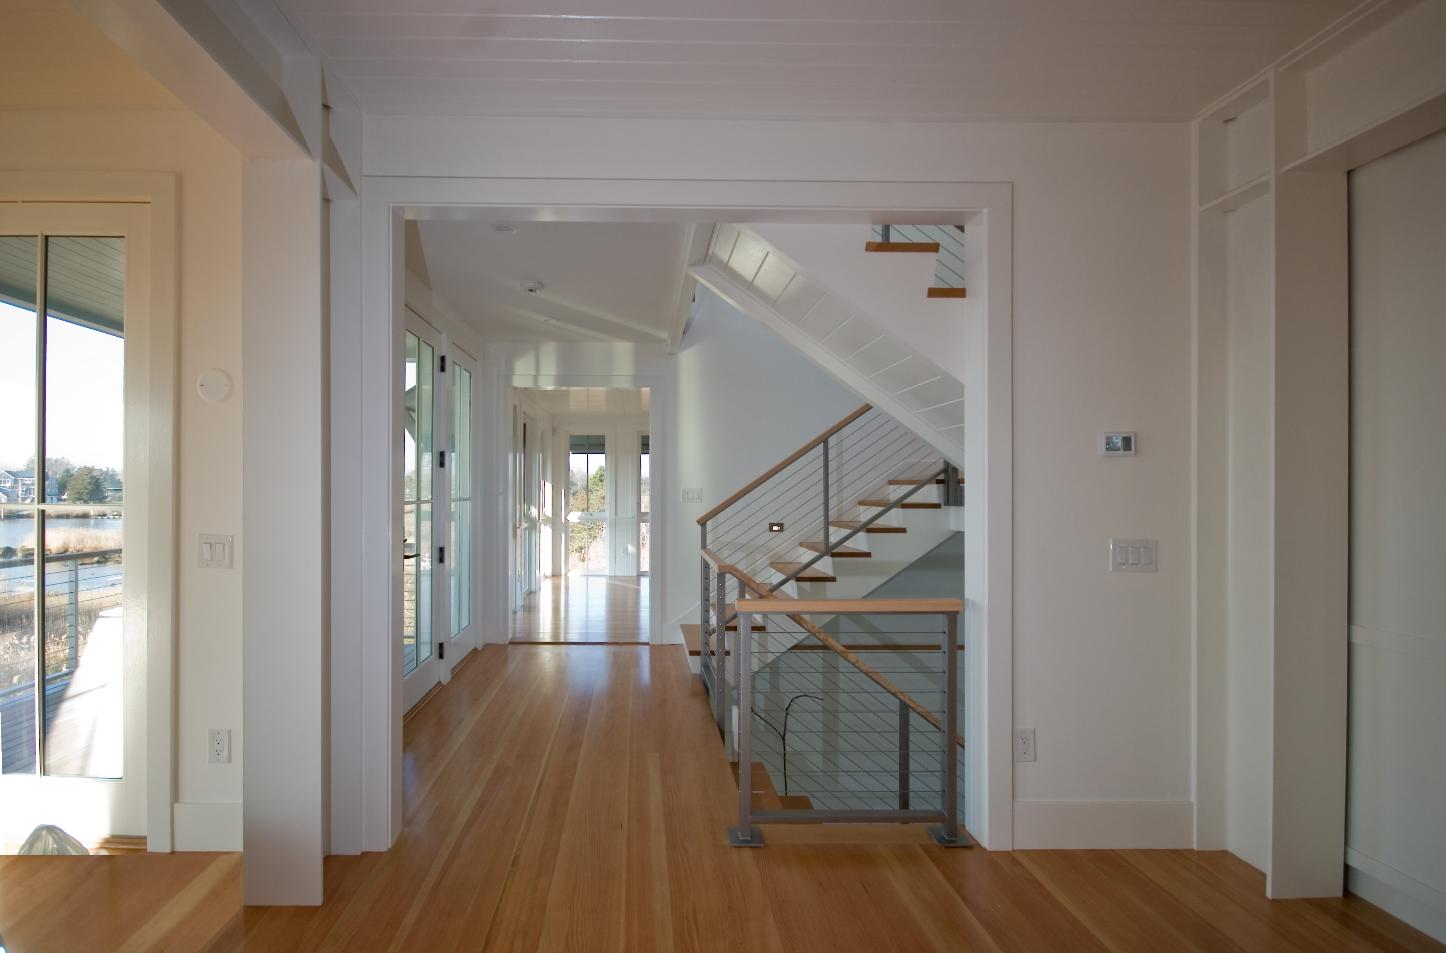 studio insitu - modern shingle style